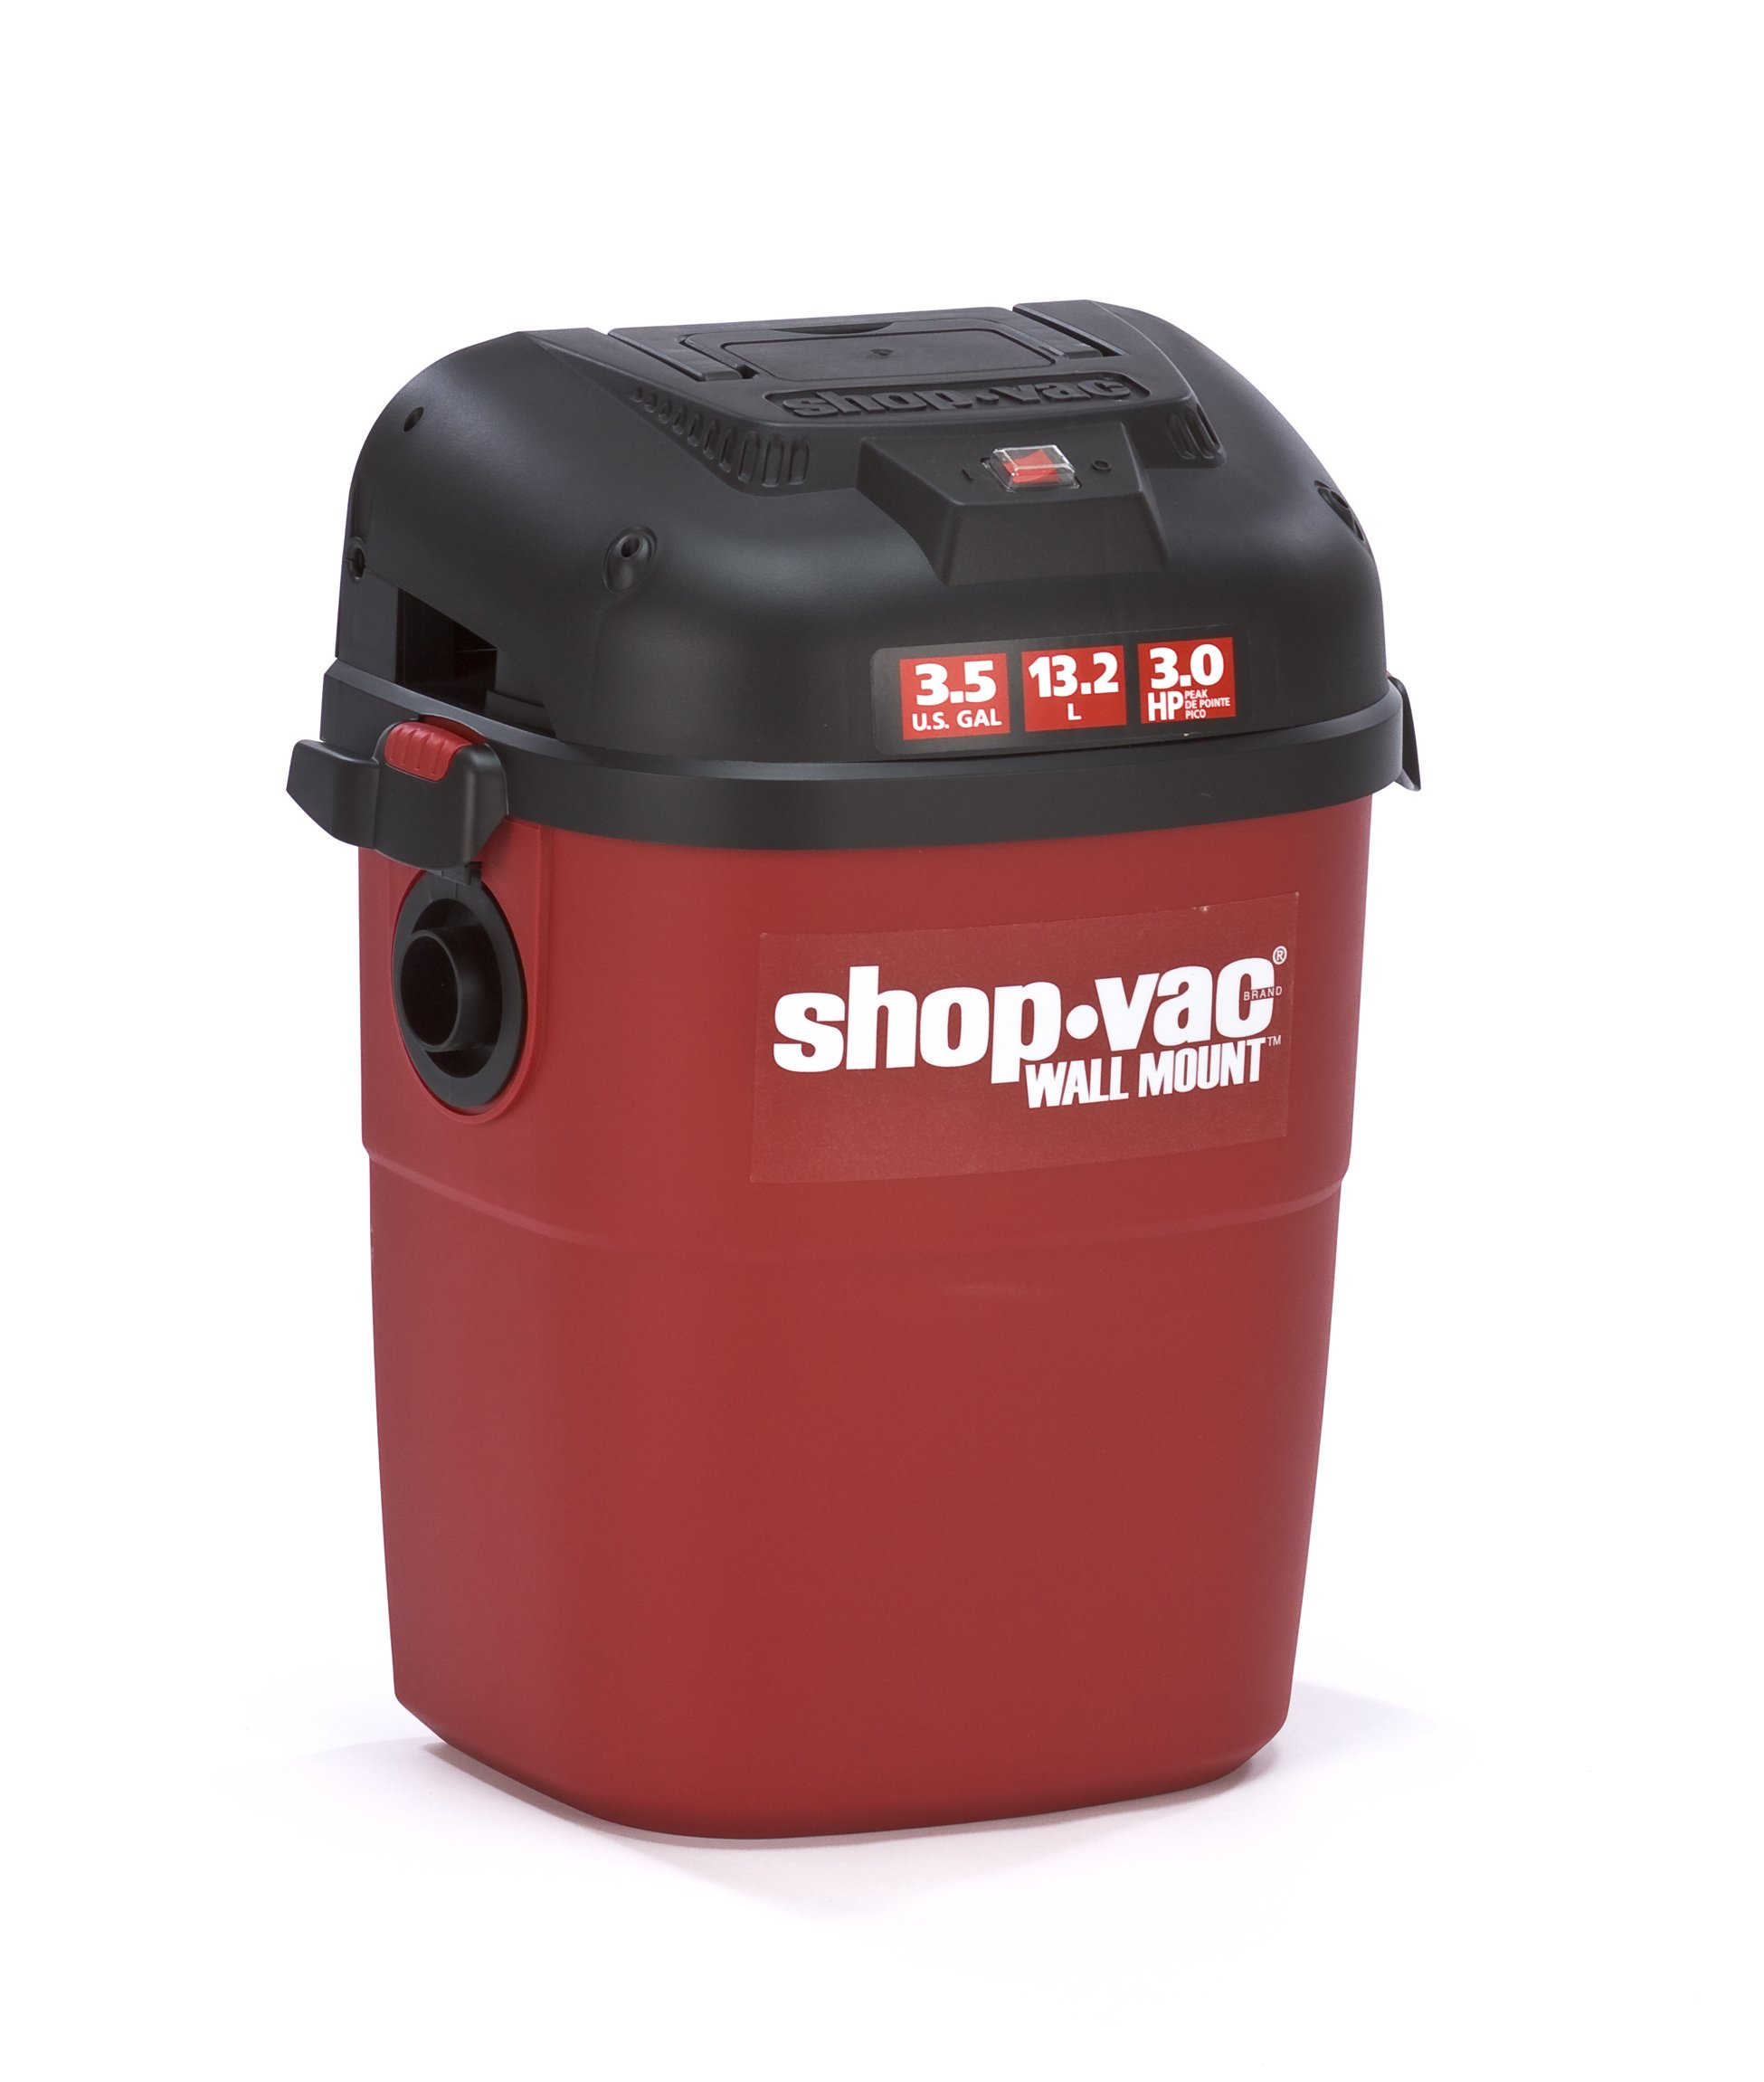 Shop-Vac 3940100 3.5-Gallon 3.0-Peak HP Wall Mount Wet/Dry Vacuum by Shop-Vac (Image #2)